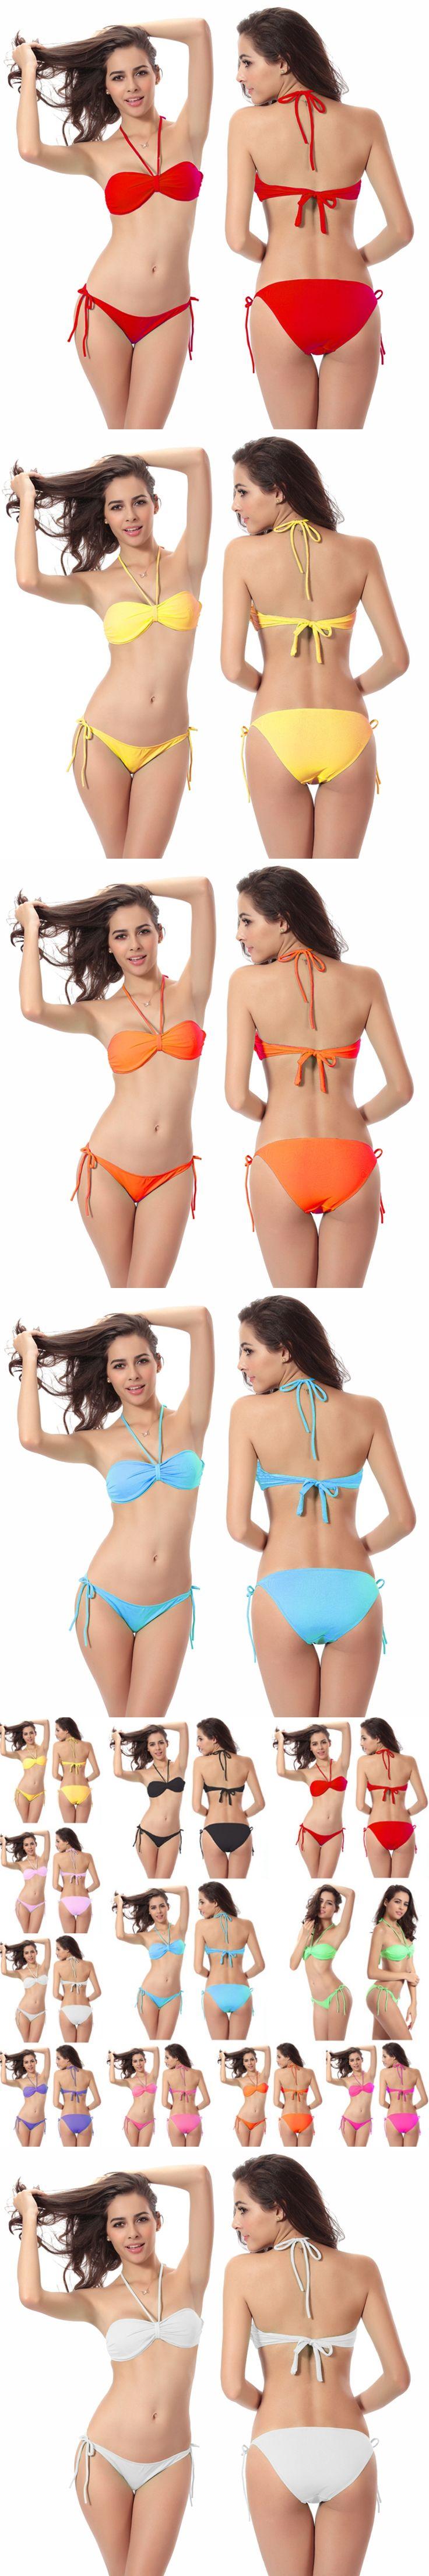 Tube Top Bikini Sexy Solid Swimsuit Women Beachwear Hot Halter Push Up Bathing Suits Maillot De Bain Femme Padded Swimming Wear